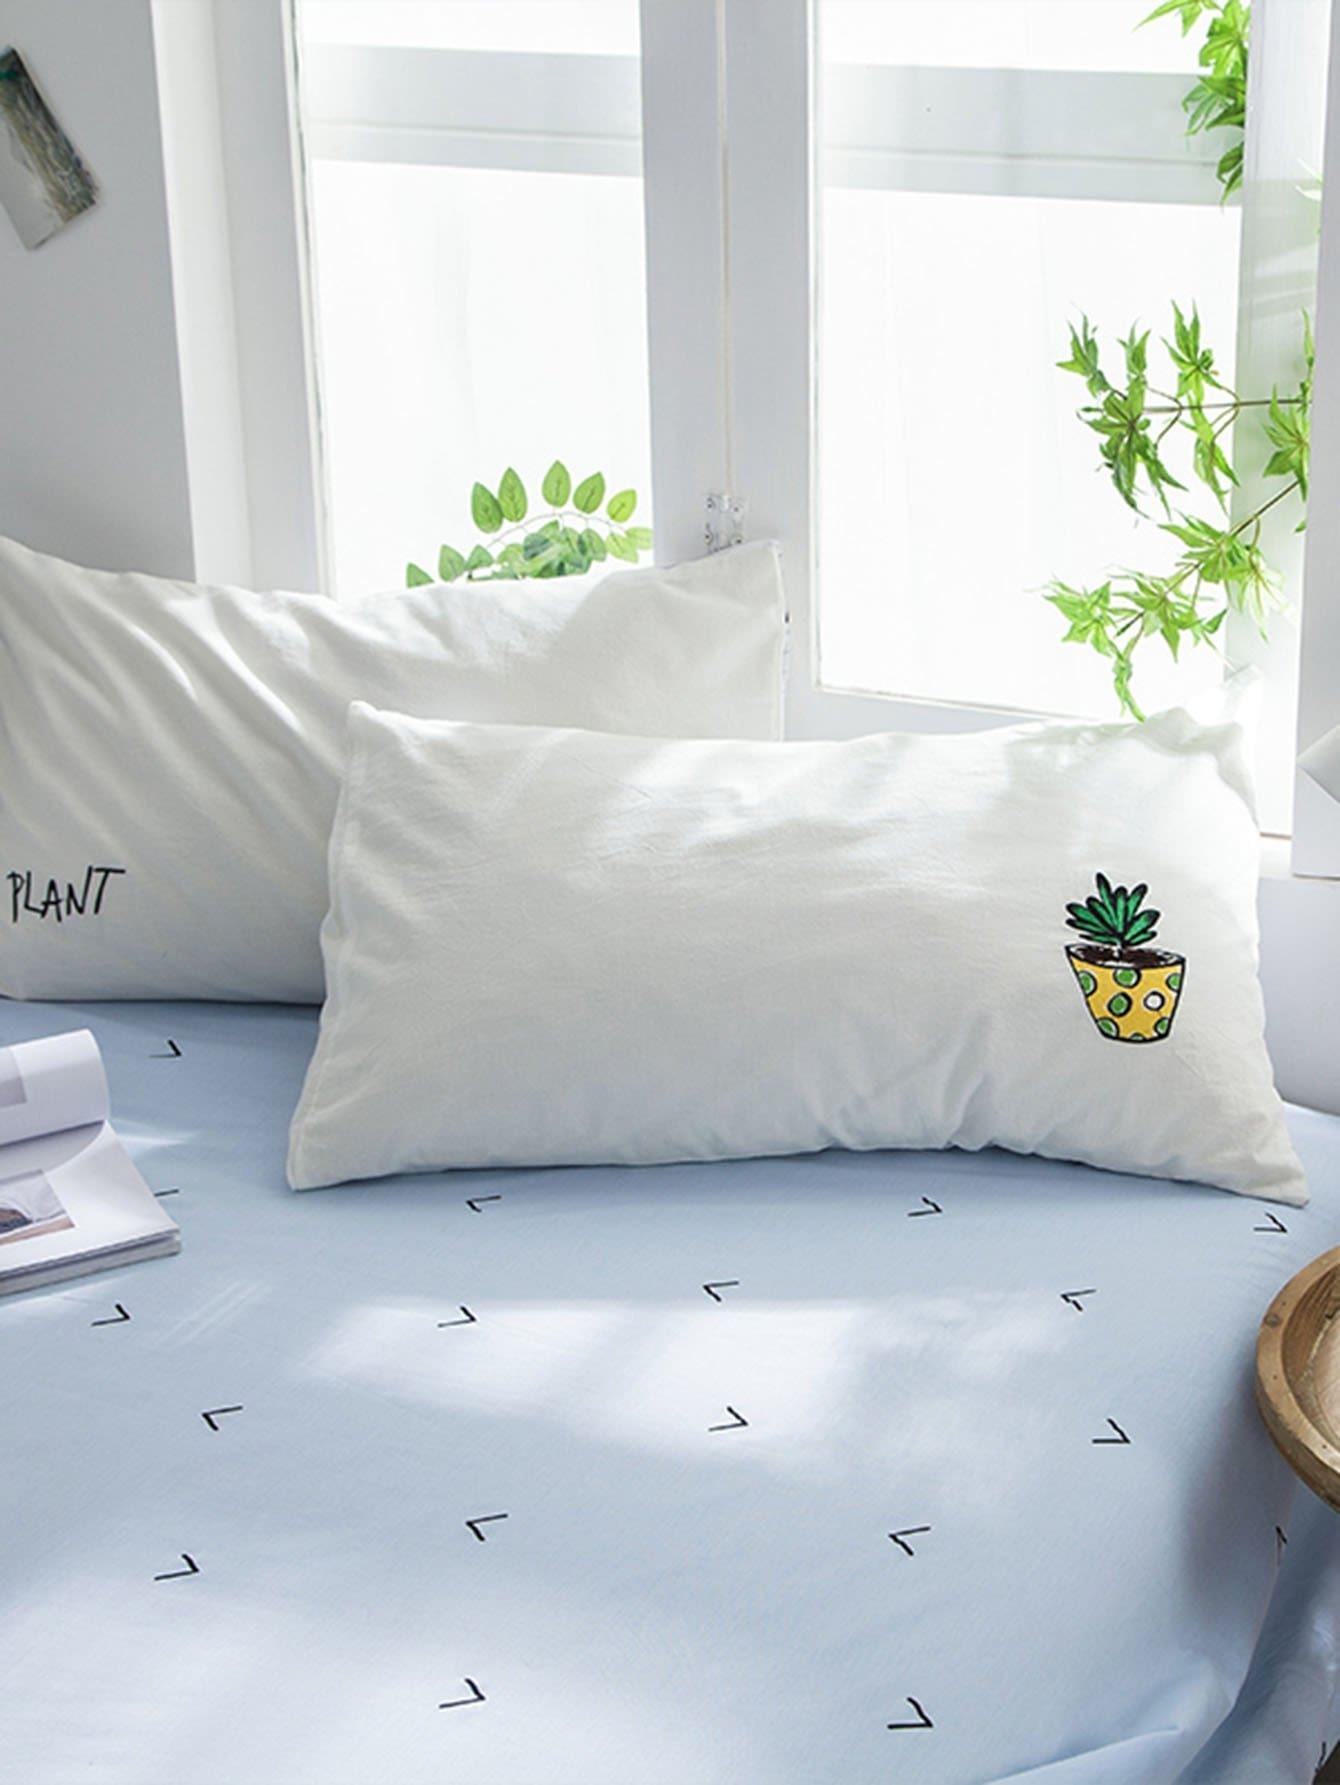 Plant & Letter Print Pillowcase Cover